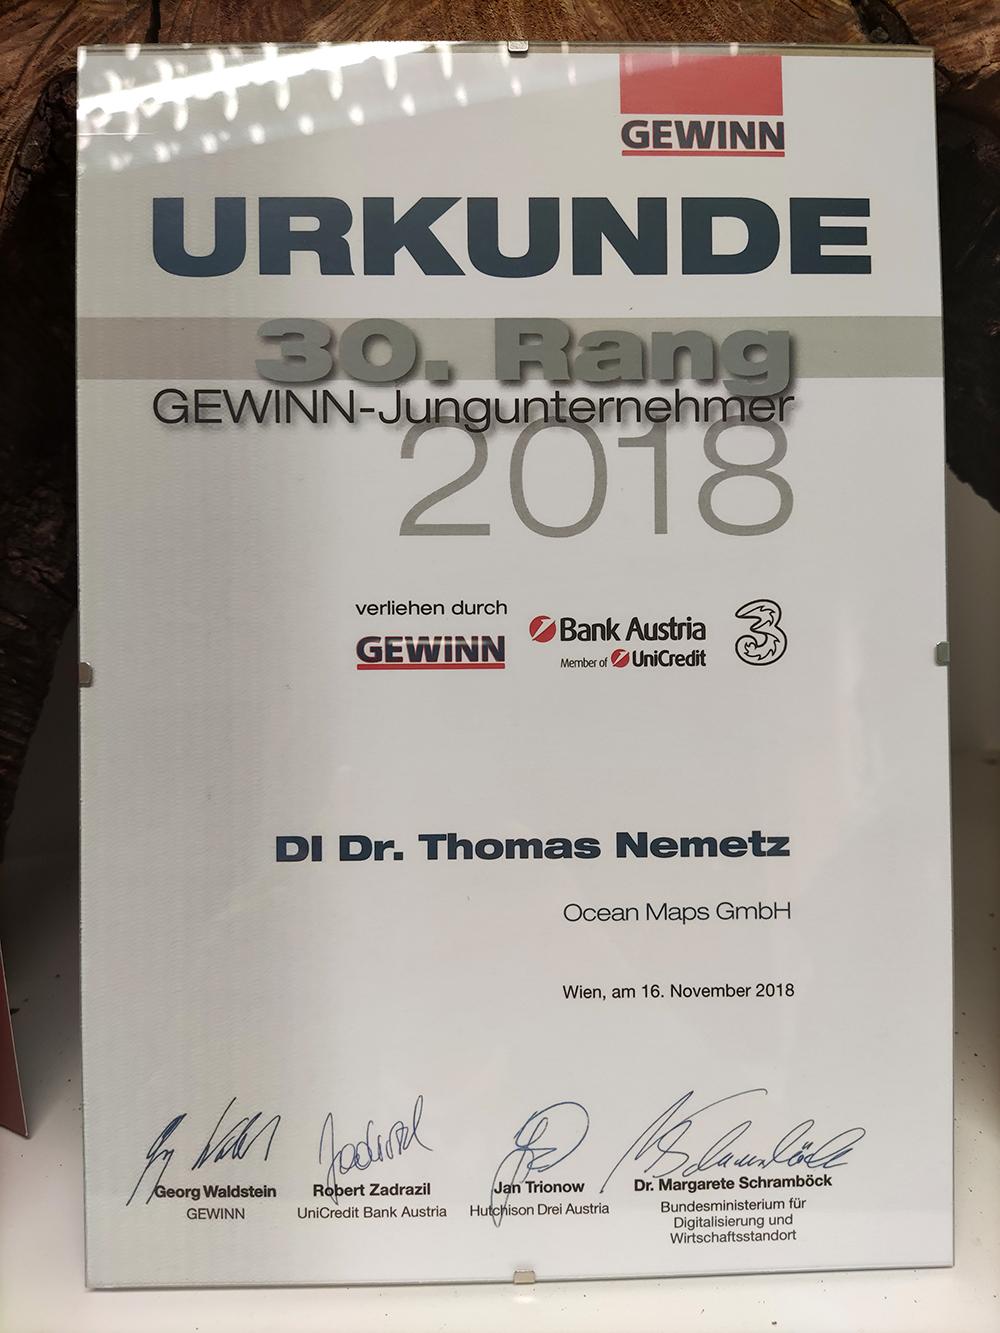 GEWINN-Jungunternehmen Ocean-Maps-GmbH 2018